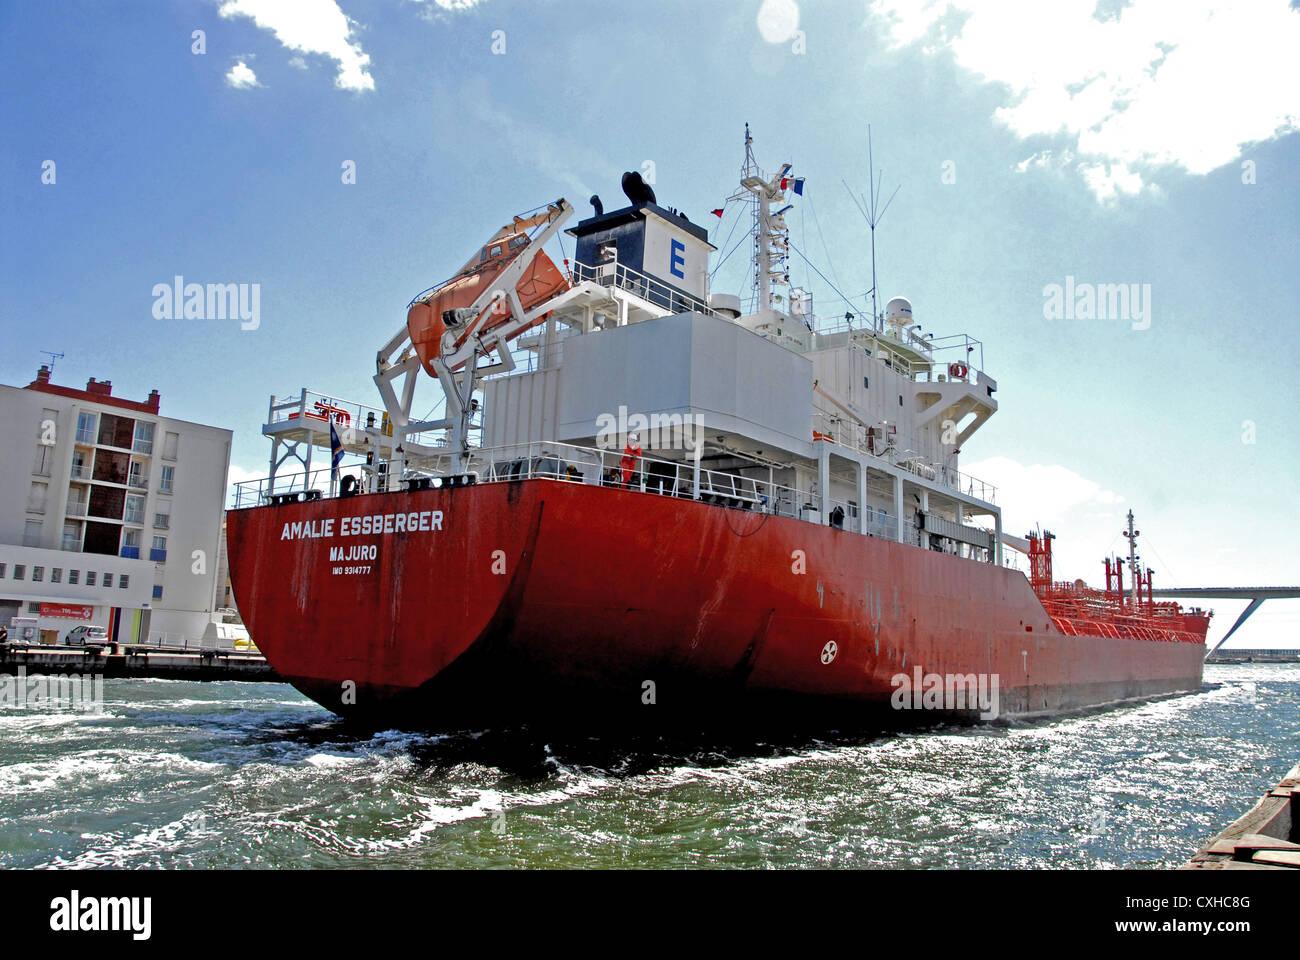 oil chemical tanker Amalie Essberger  Martigues  Bouches-du-Rhone France Europe - Stock Image